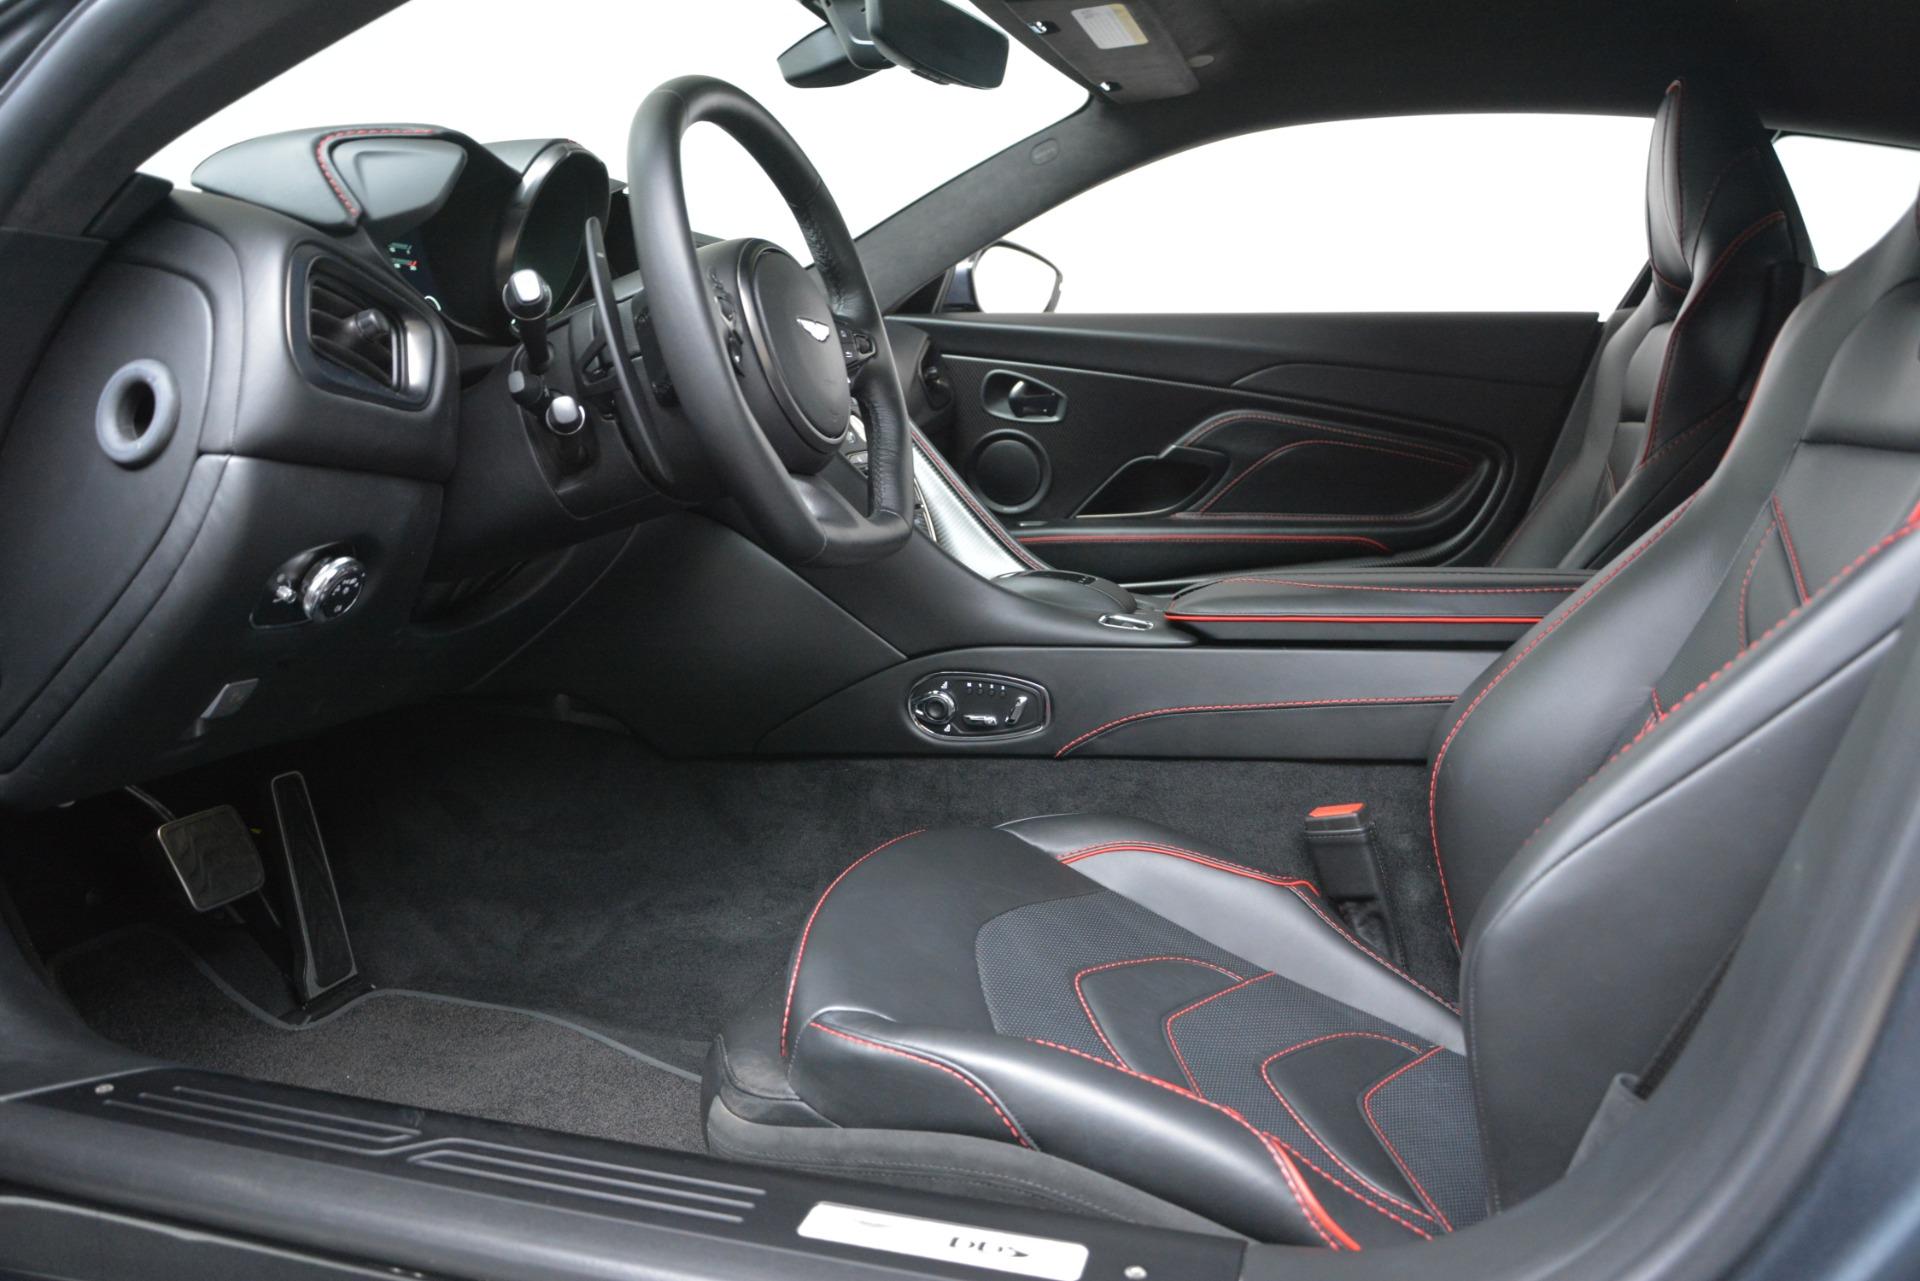 New 2019 Aston Martin DBS Superleggera For Sale In Greenwich, CT 3318_p12